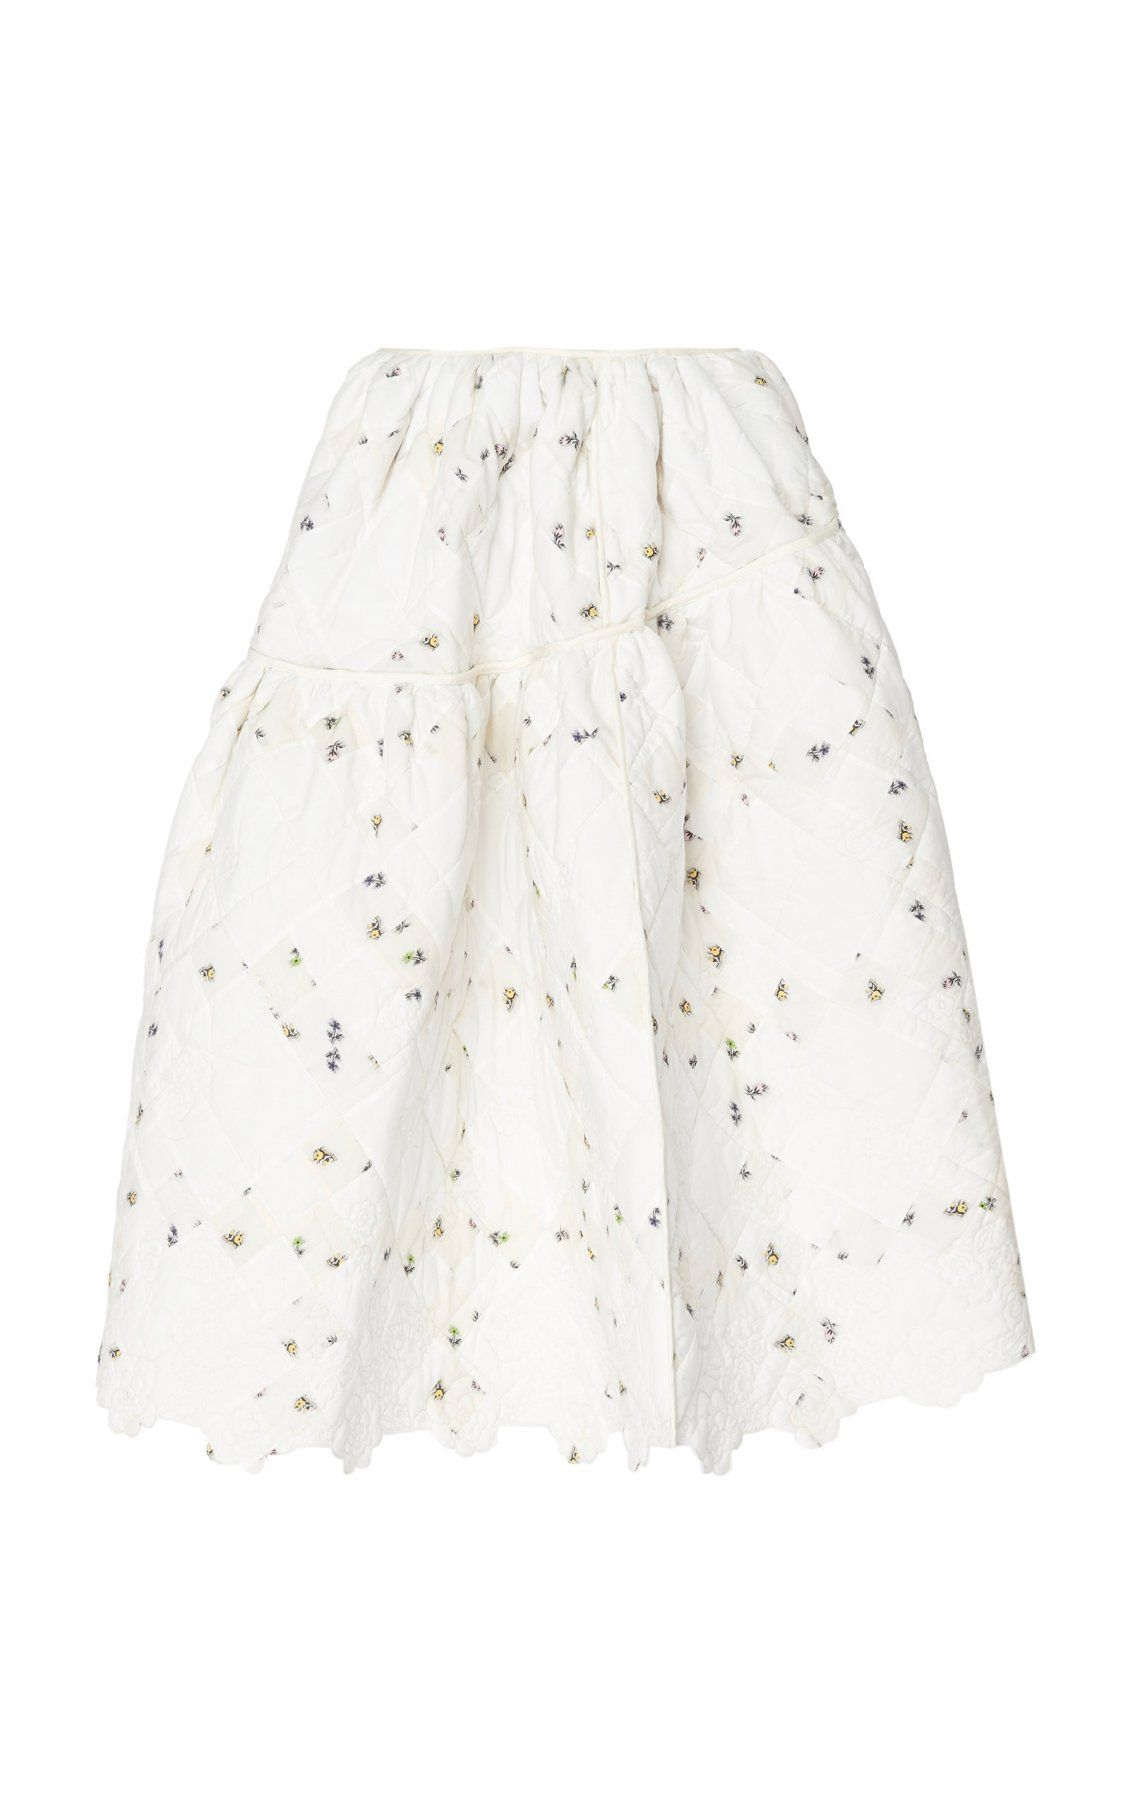 f664c4c4 Rosie A-Line Cotton Ball Skirt by Cecilie Bahnsen PF19   Moda Operandi